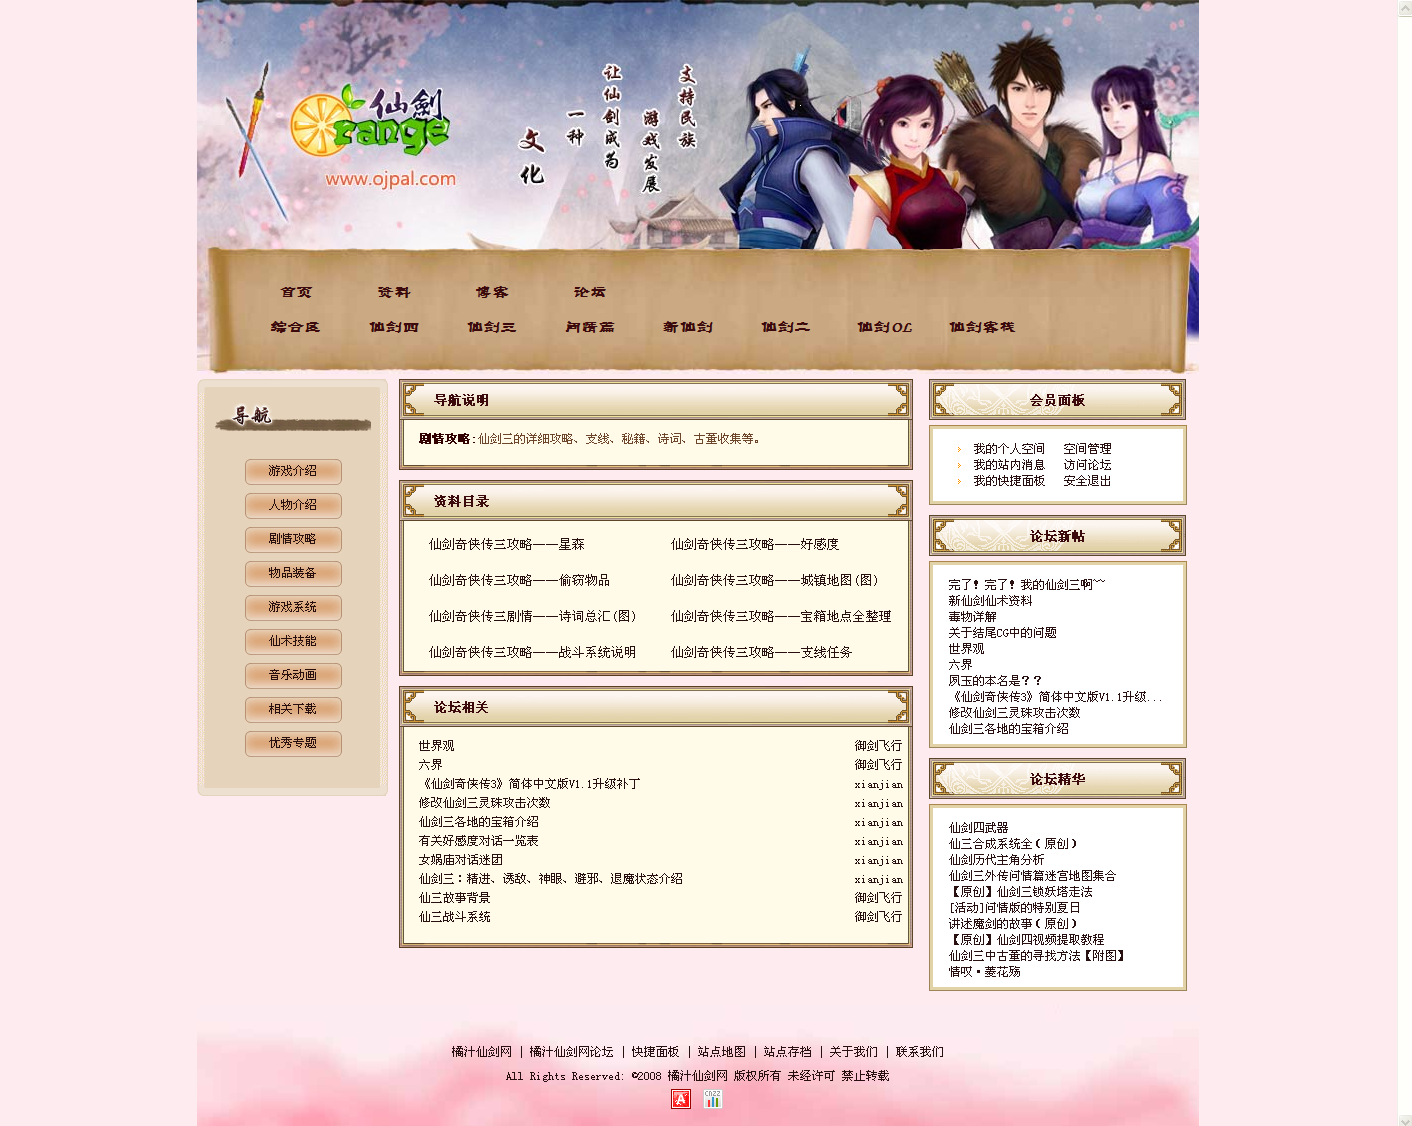 about:剧情攻略-橘汁仙剑网-仙剑文化家园.png